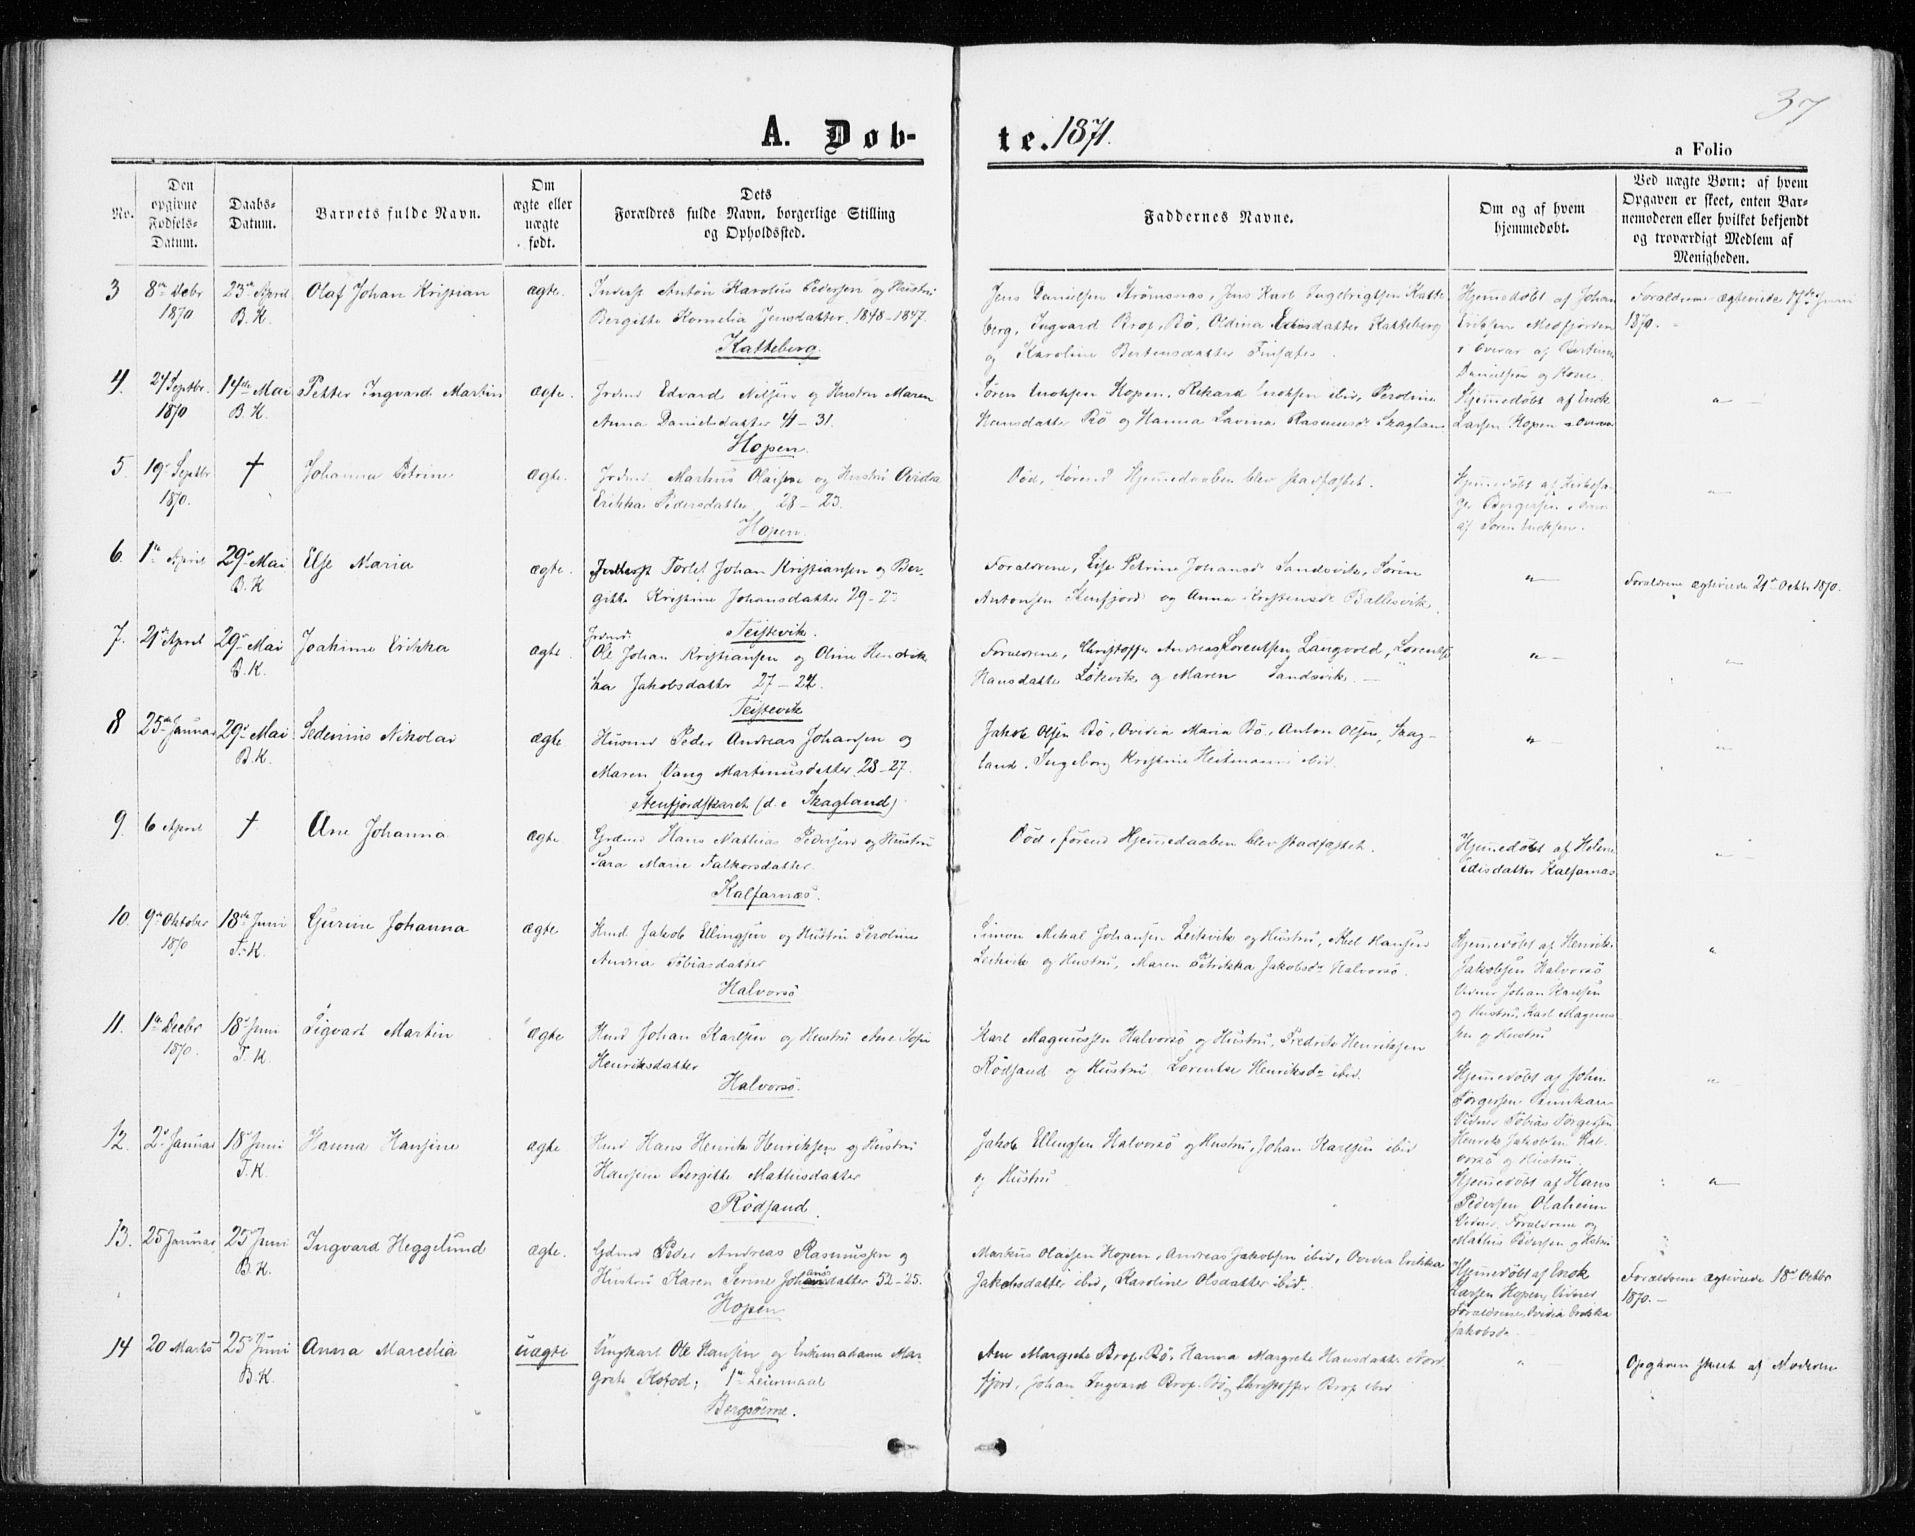 SATØ, Mefjord/Berg sokneprestkontor, G/Ga/Gaa/L0002kirke: Ministerialbok nr. 2, 1860-1872, s. 37